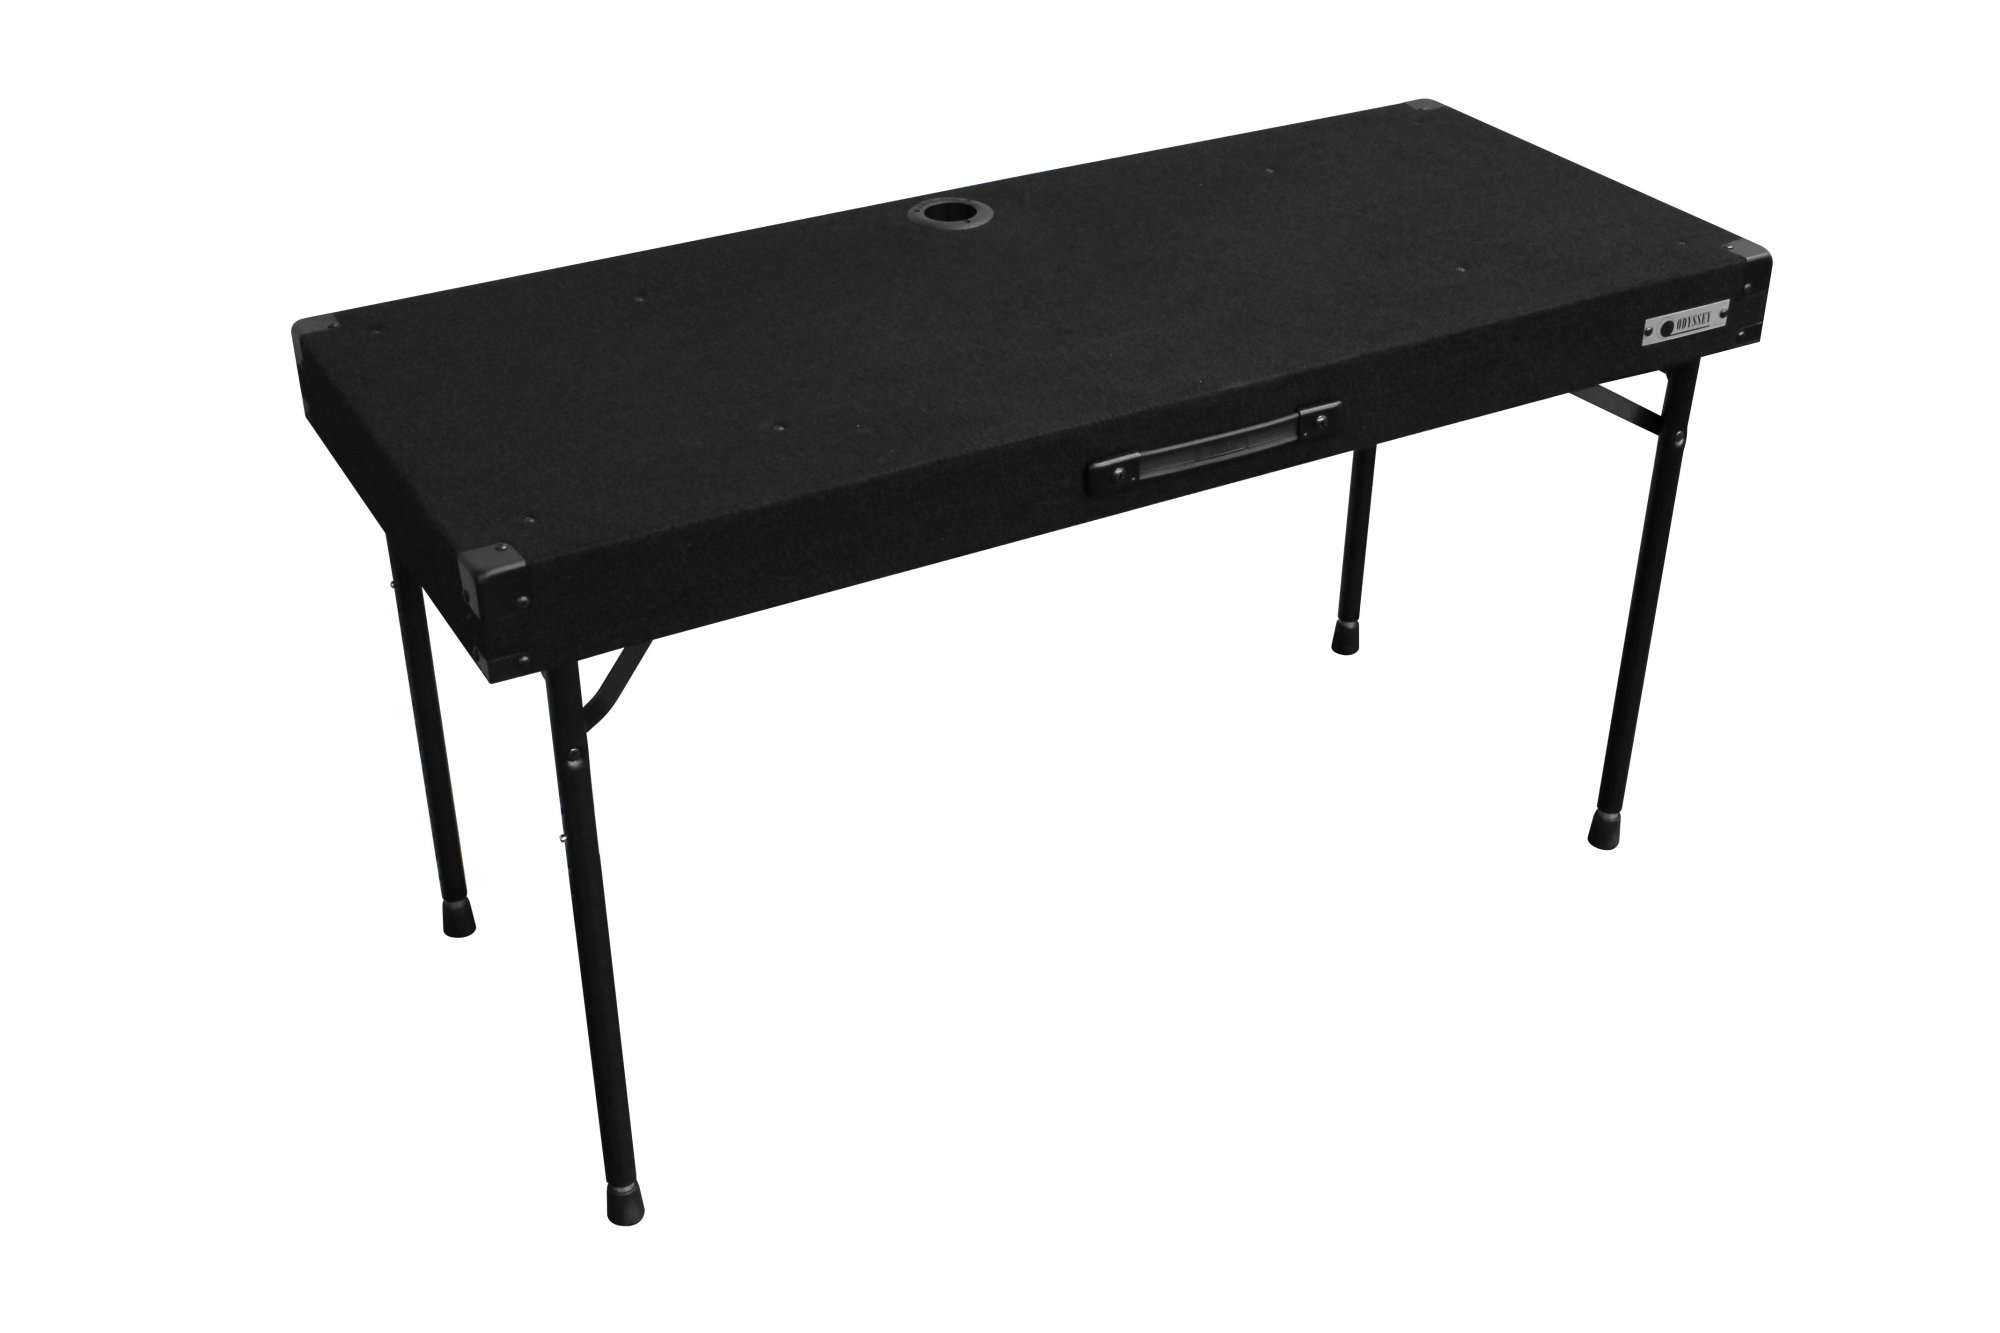 Odyssey Case CTBC2048 - DJ Work Table, Adjustable Legs, Carpeted